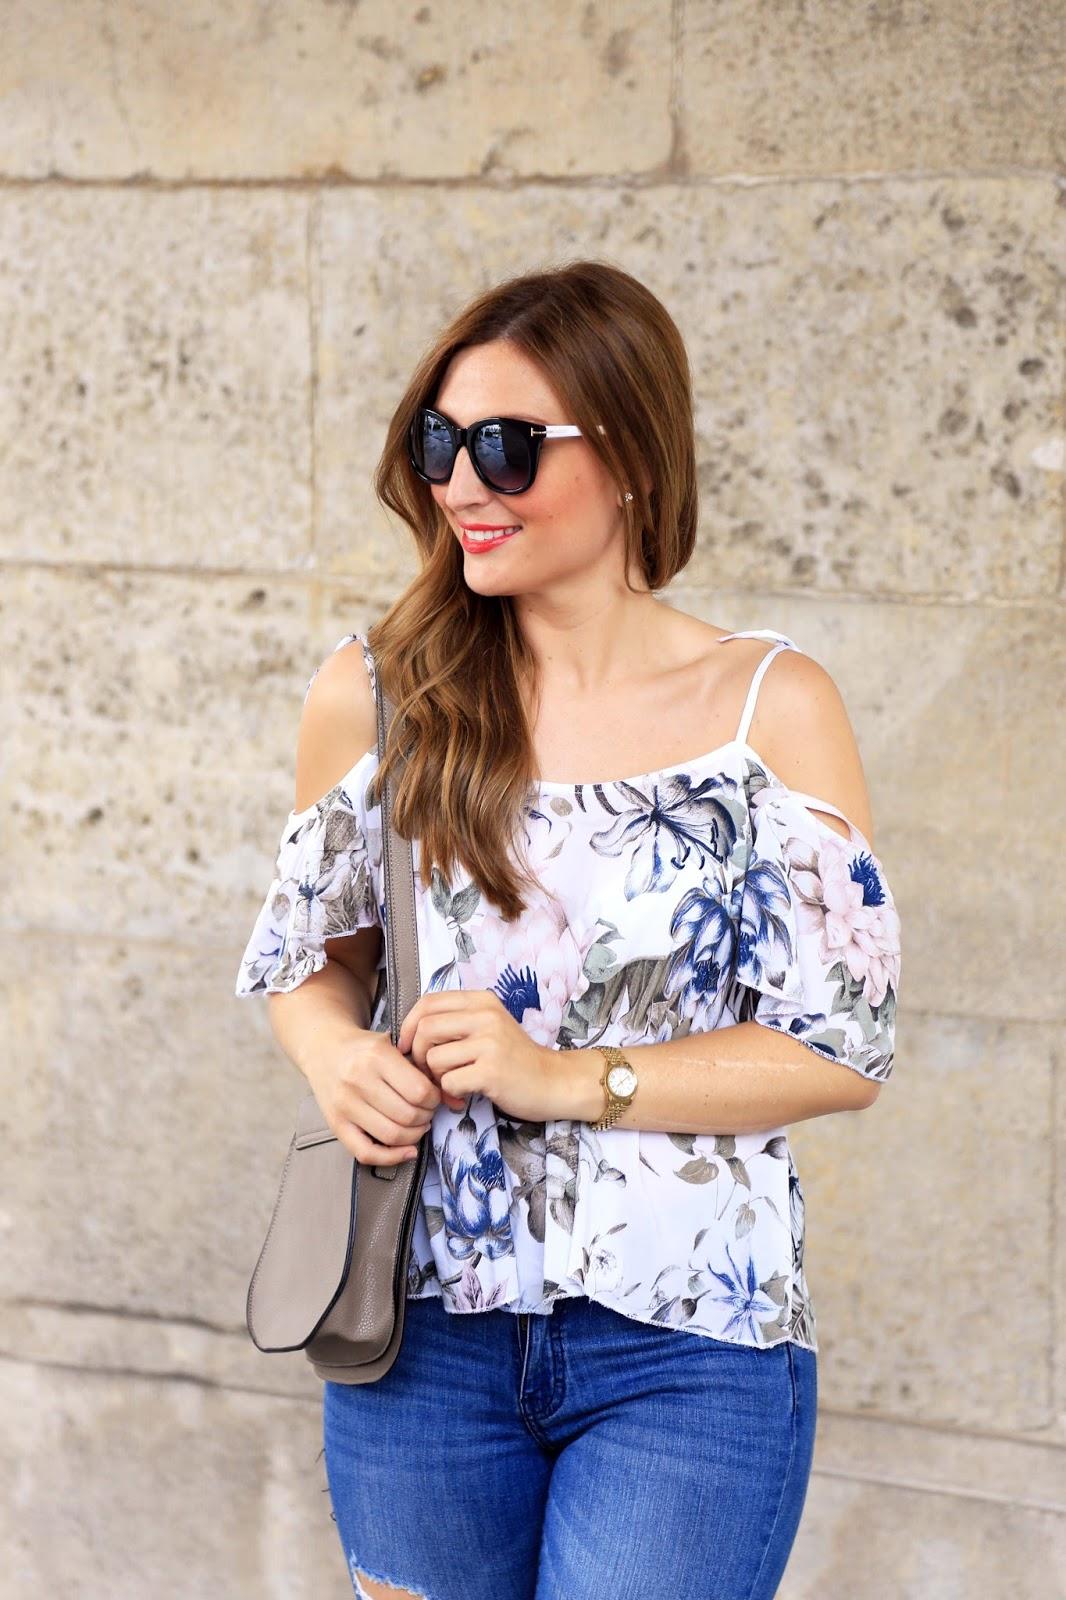 Bardot Bluse - Bluse im Bardot Look - Fashionstylebyjohanna - Bloggerlooks für den Sommer - Sommer Blogger Look